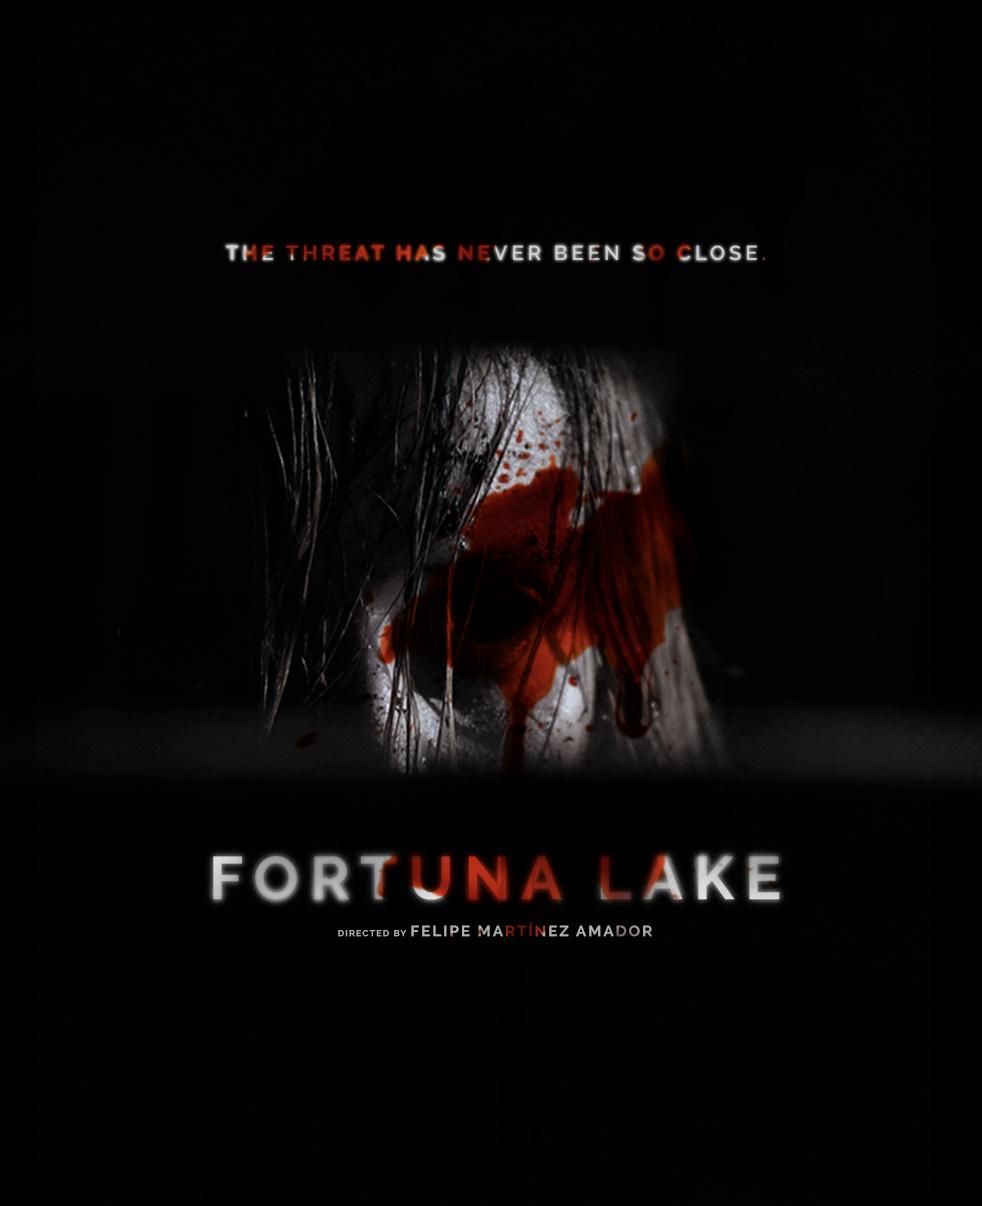 FORTUNA LAKE